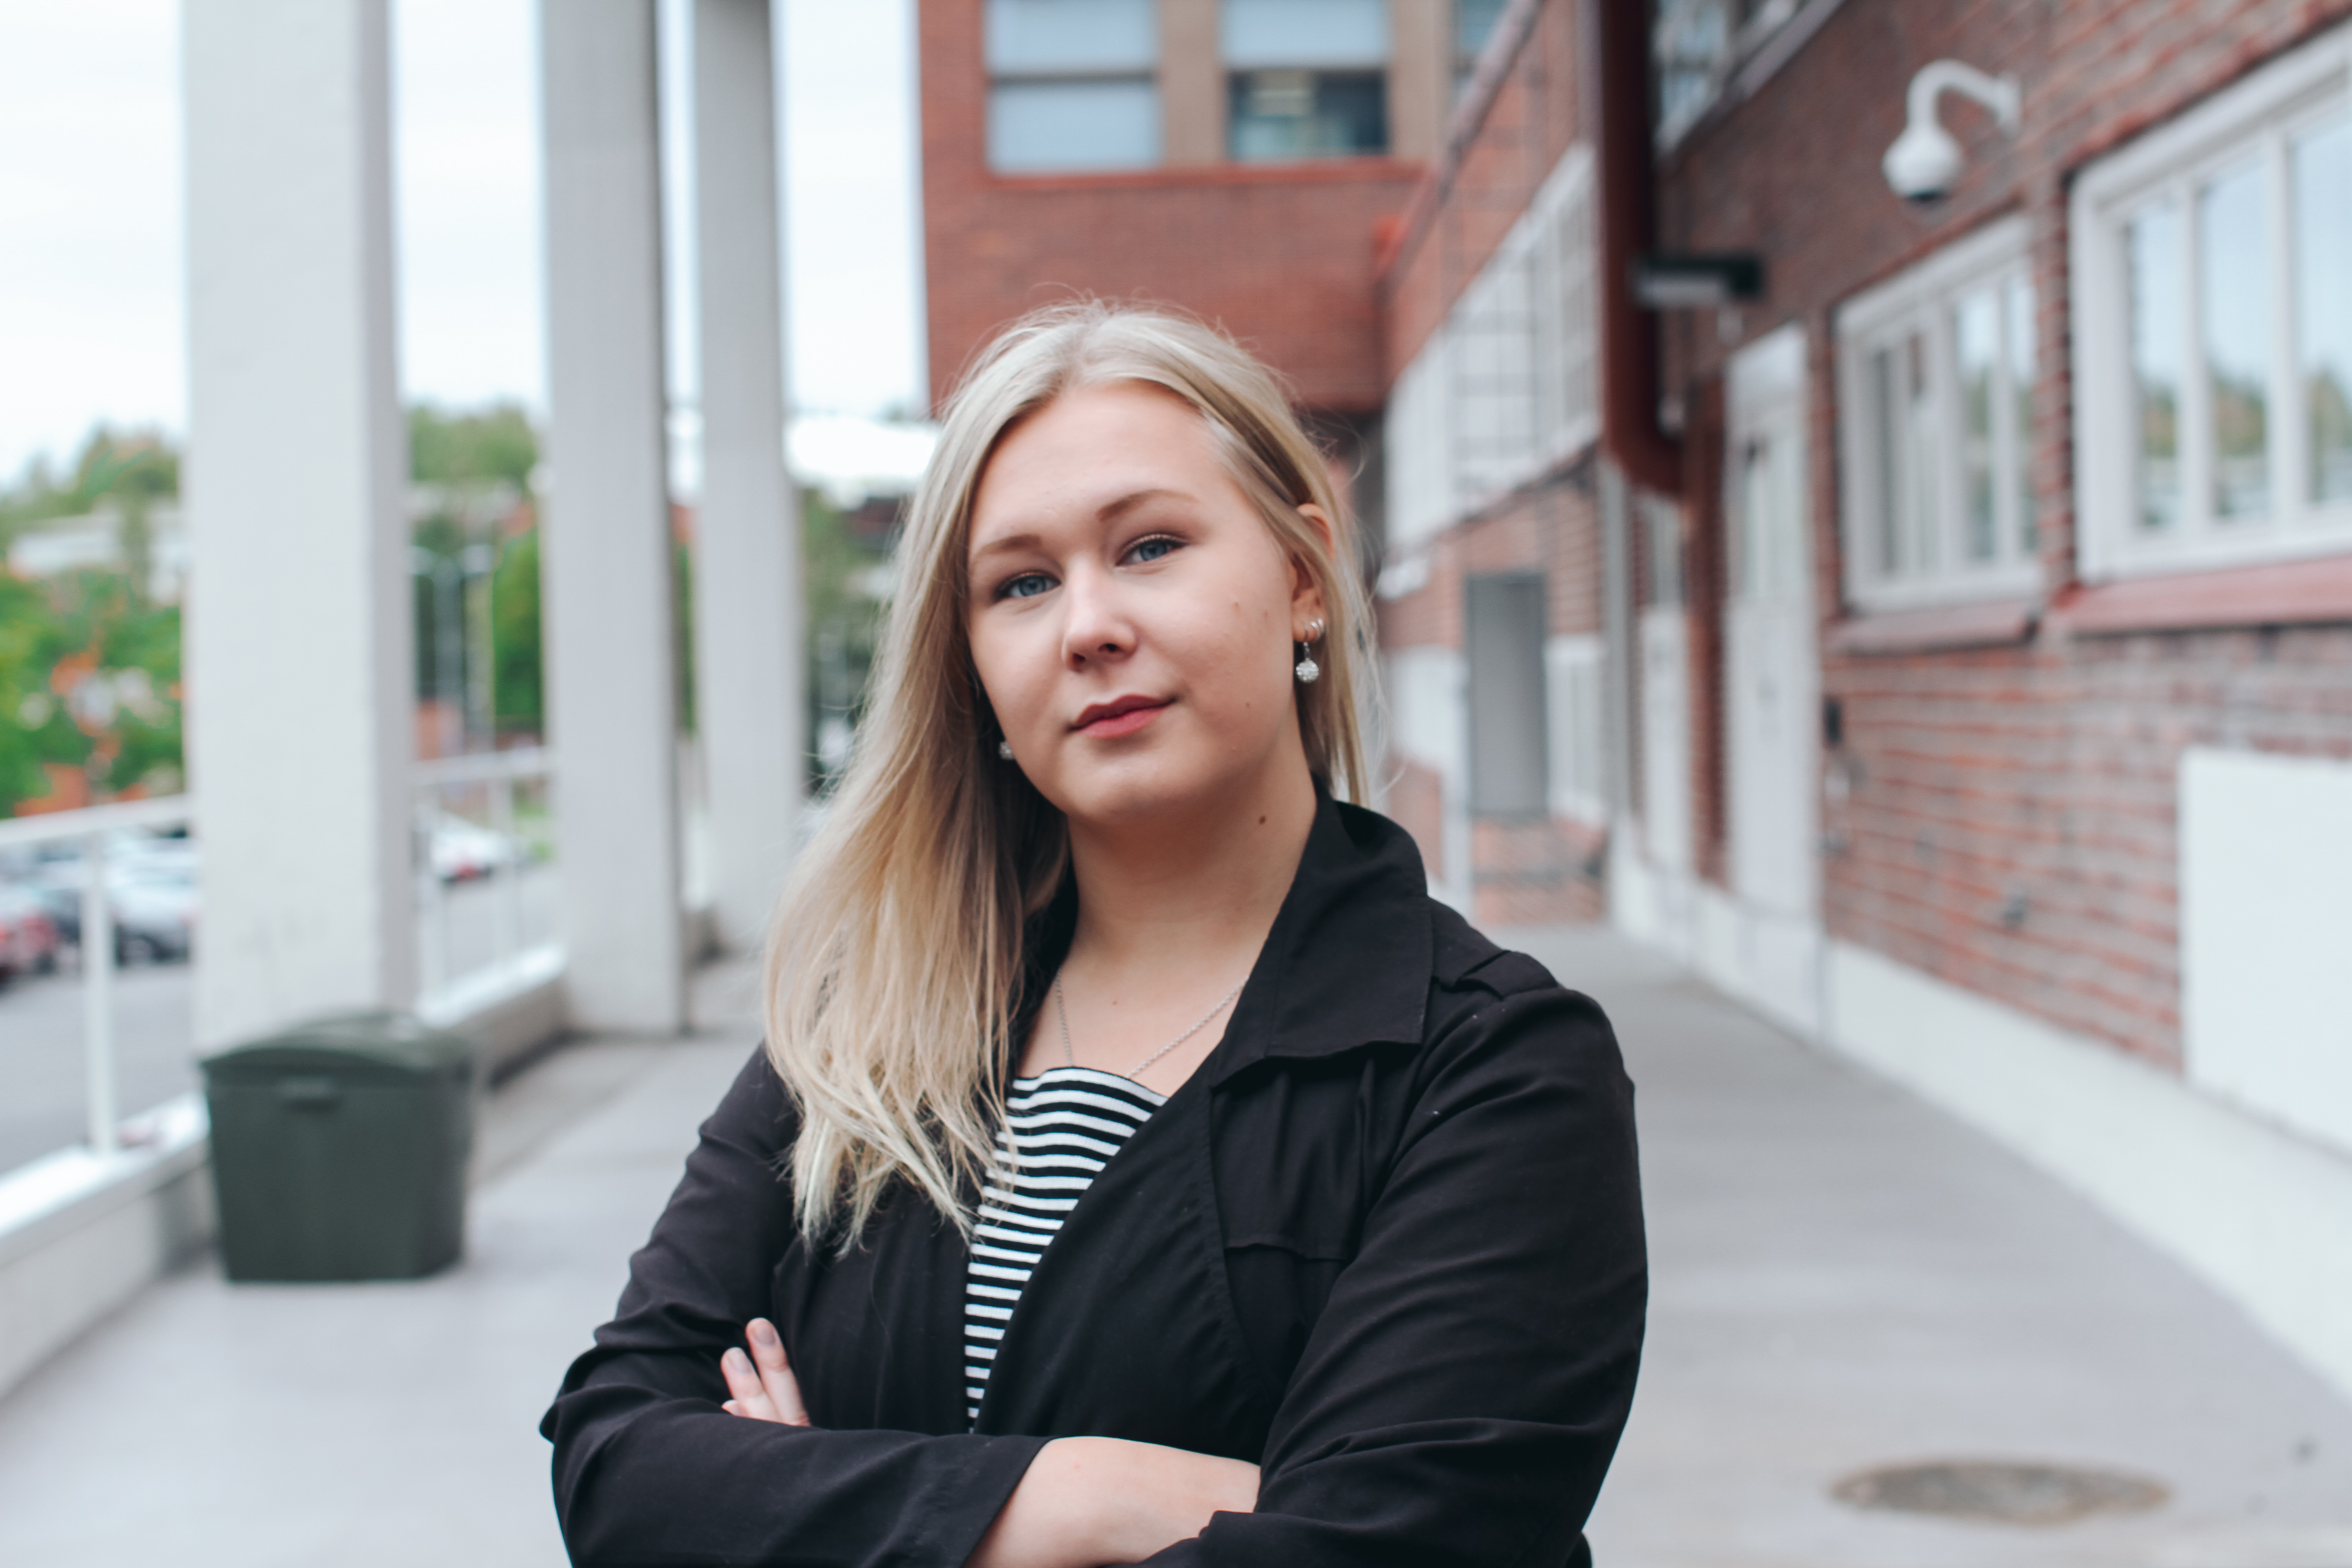 Sdp Ehdokkaat Keski-Suomi